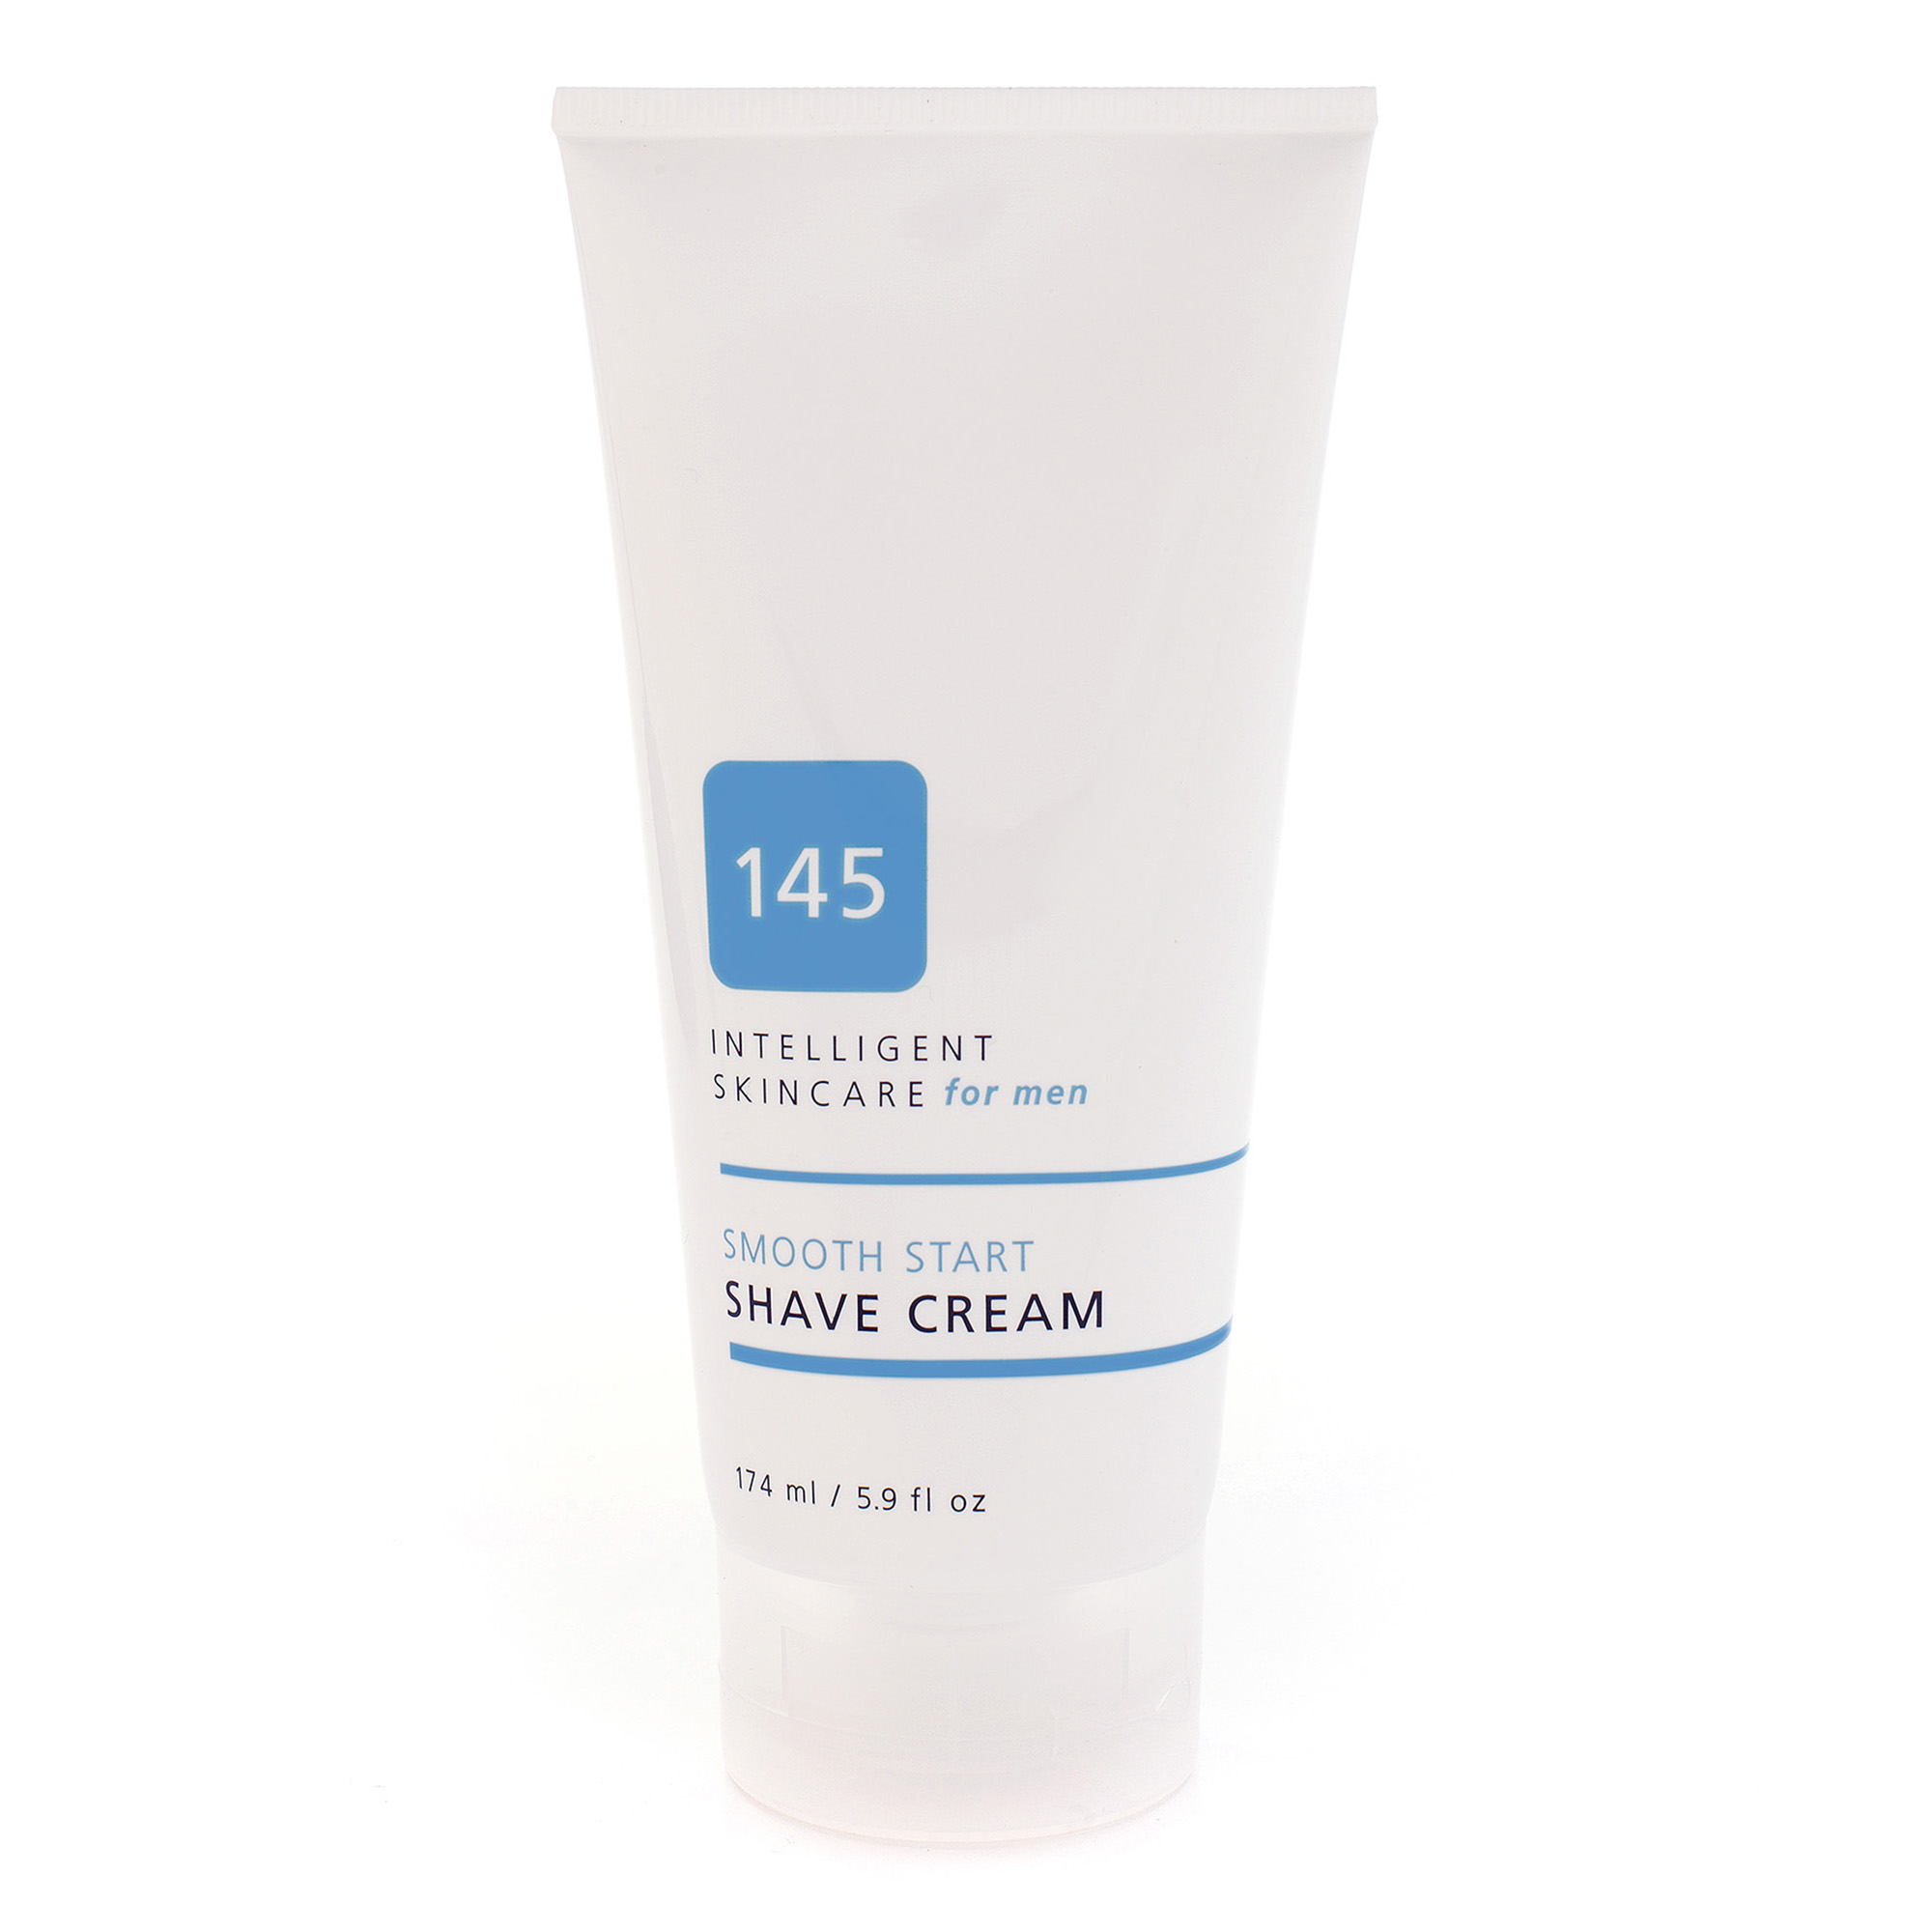 Earth Science 145 Intelligent Skincare for Men - Smooth Start Shave Cream - GNC 145 Intelligent Skincare for Men - Smooth Start Shave Cream - 웹